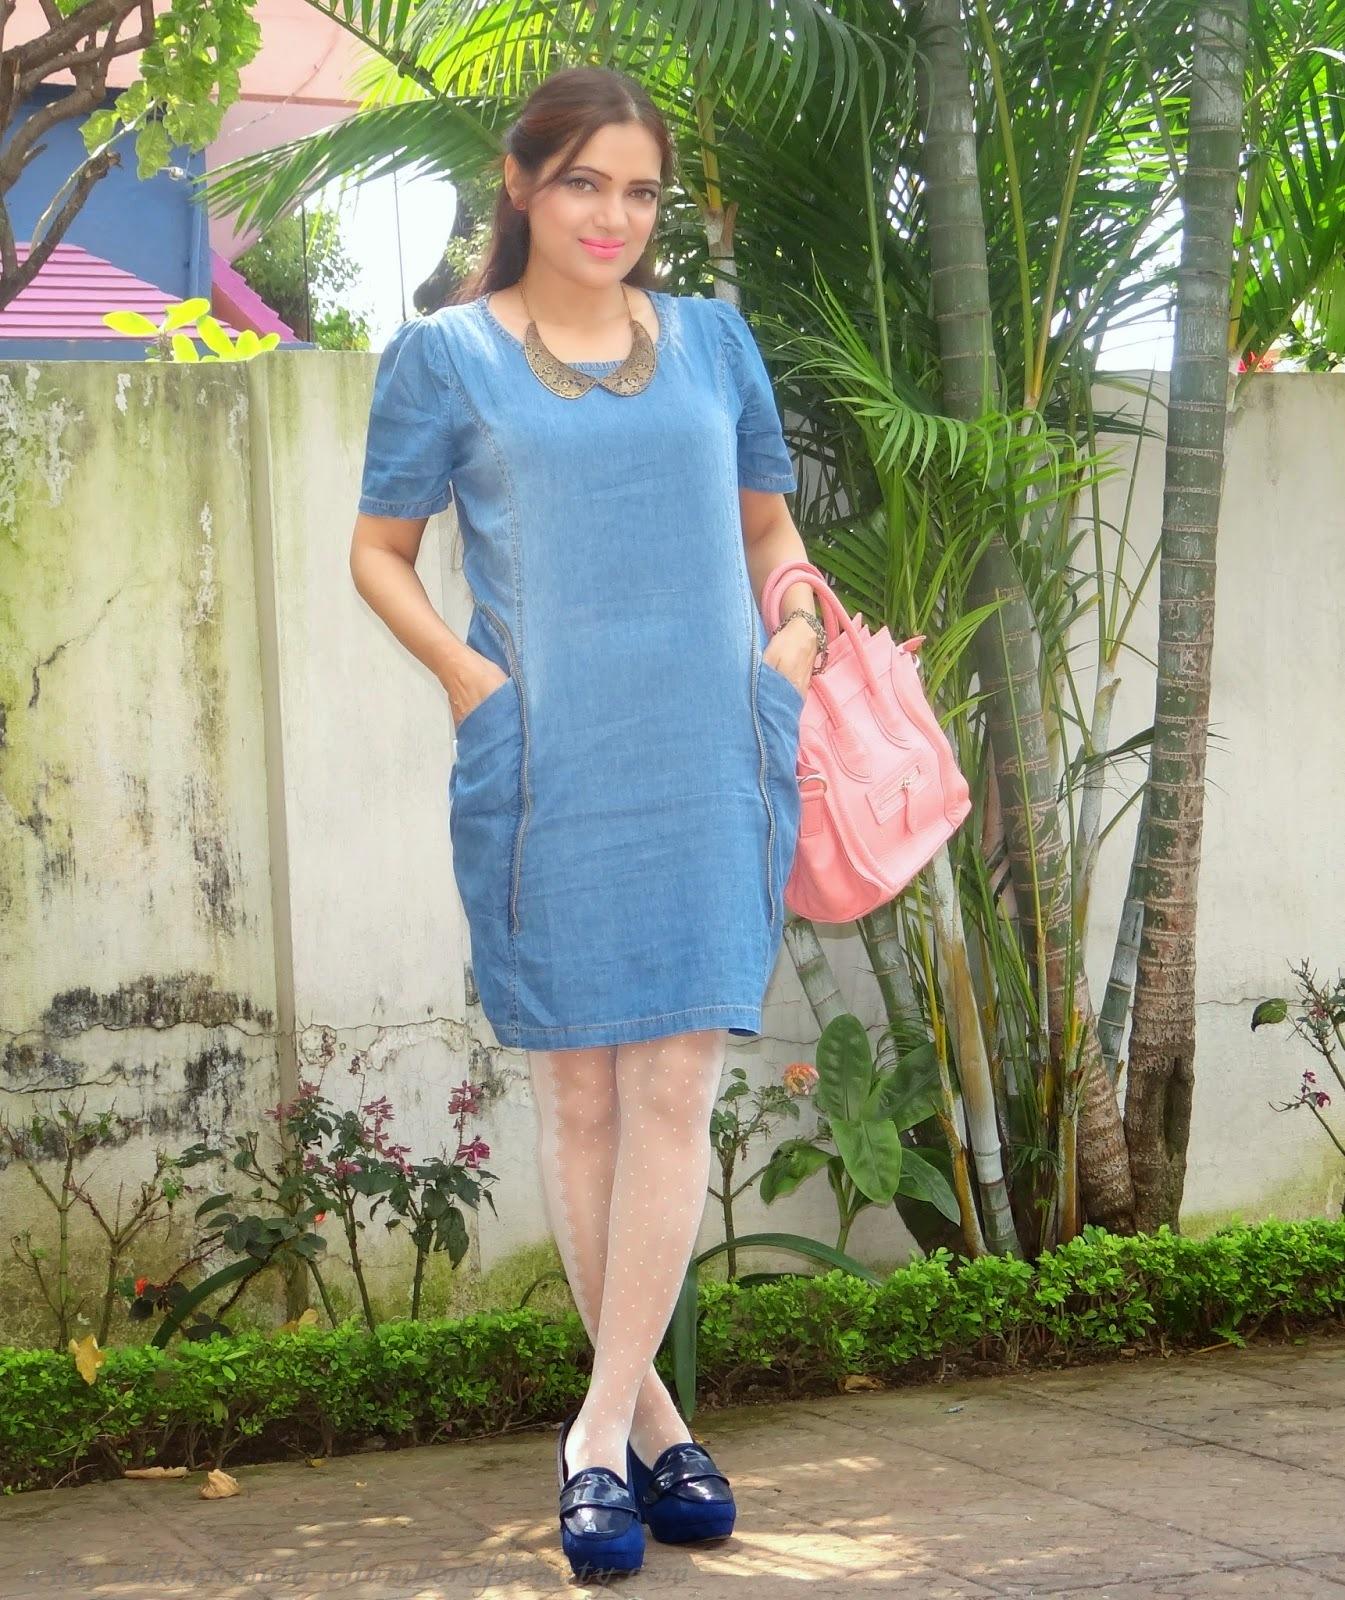 Summer Denim- 5 Denim Essentials|How to style Denim, Stylemoi, Indian Fashion Blogger, Chamber of Beauty